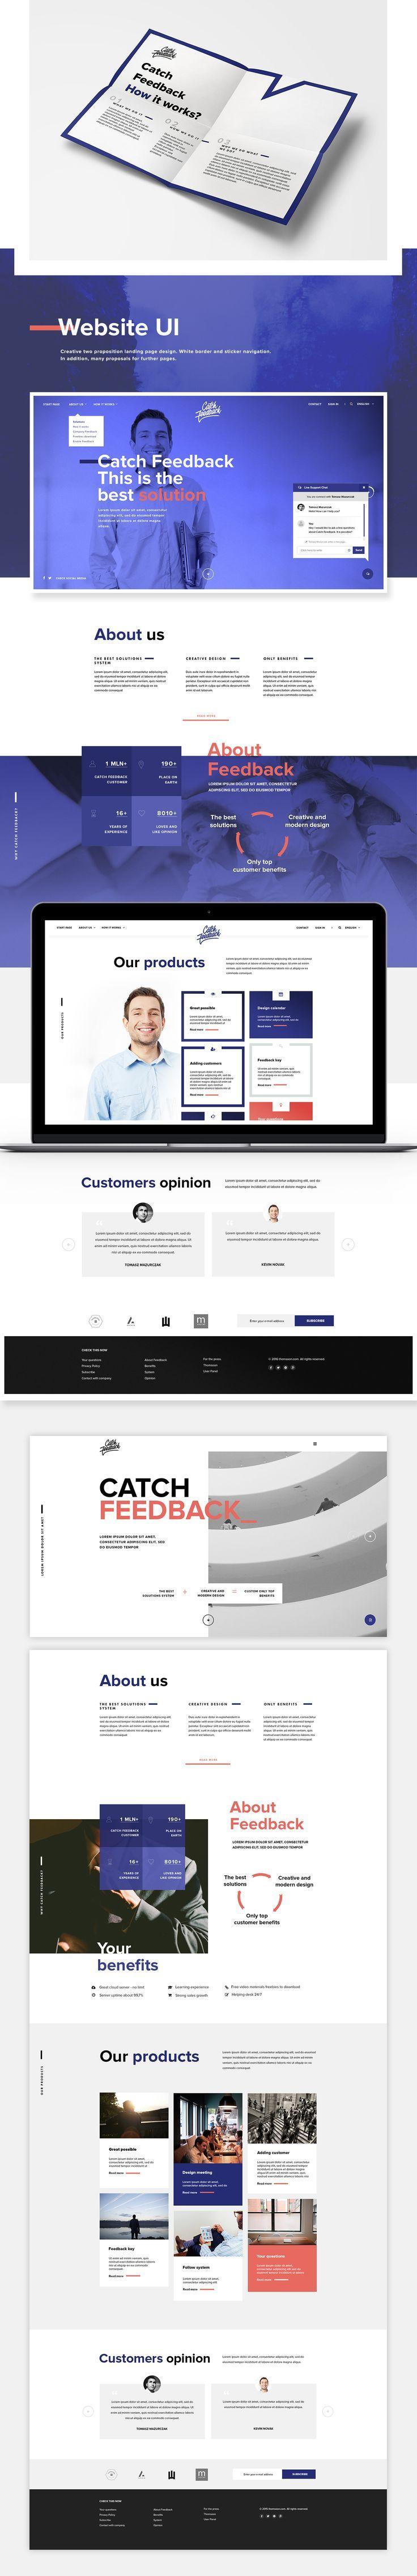 Catch Feedback - Branding and Website on Behance